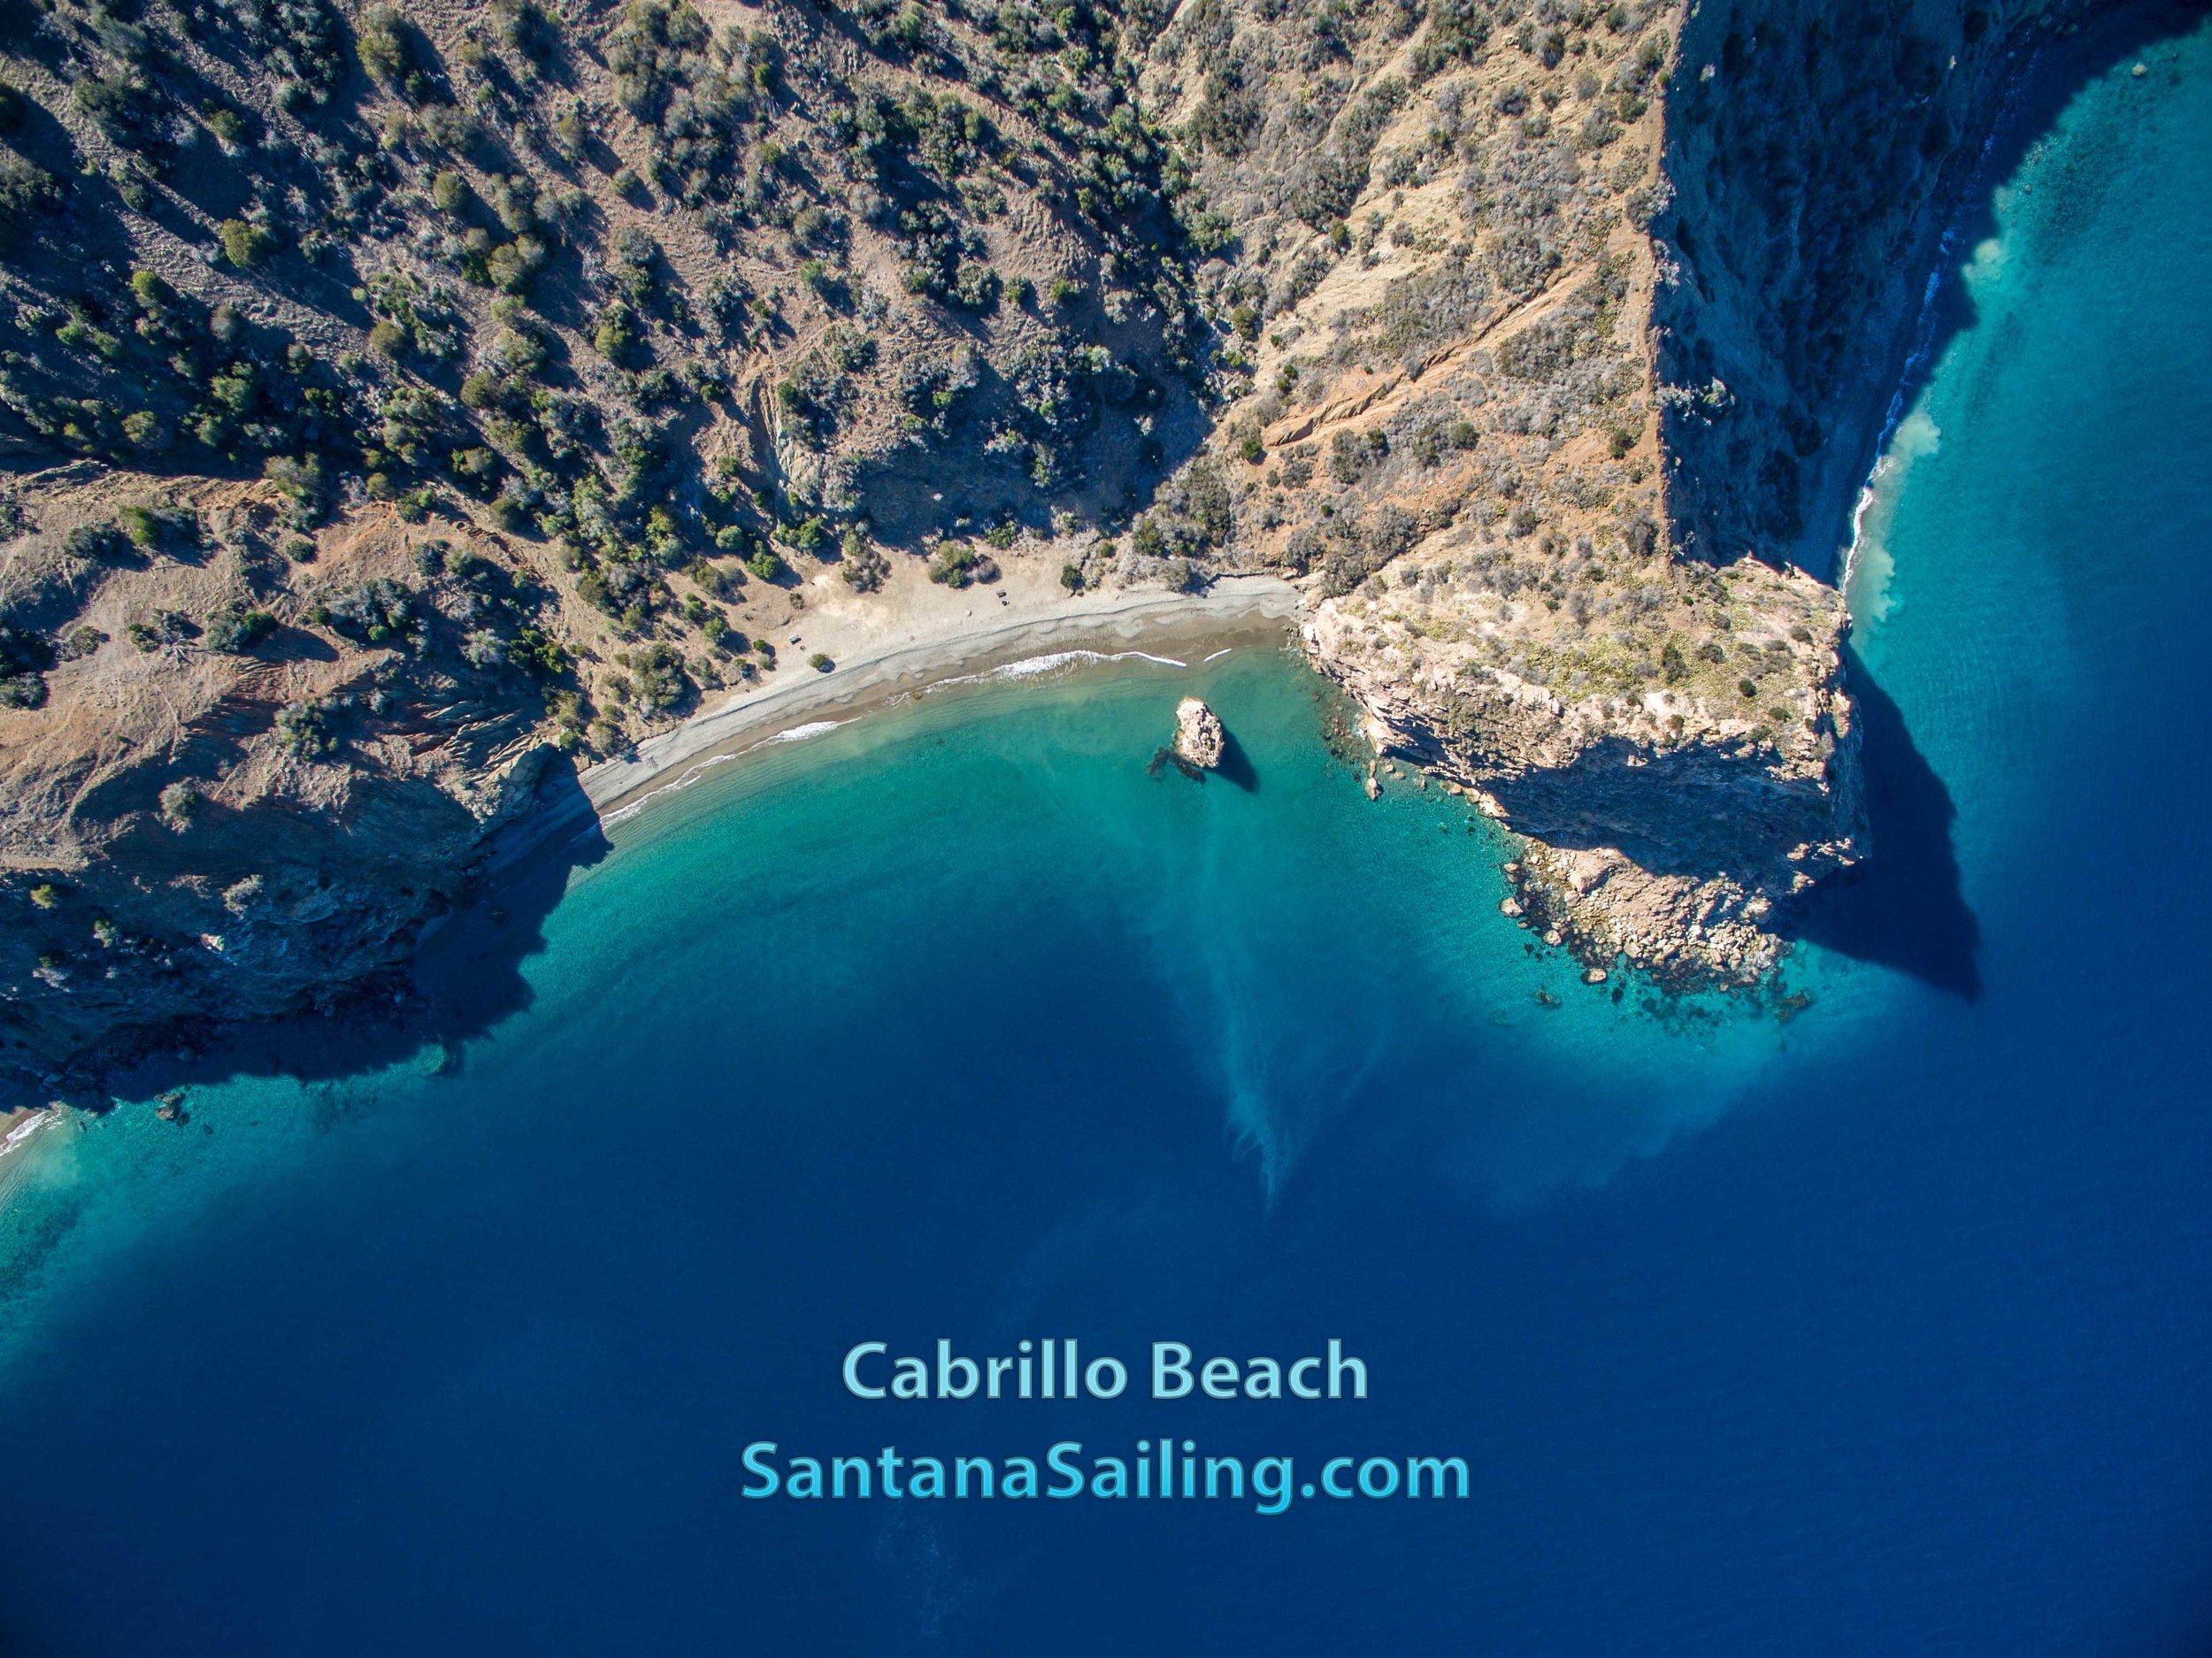 Cabrillo Beach - Sailing to Catalina Island